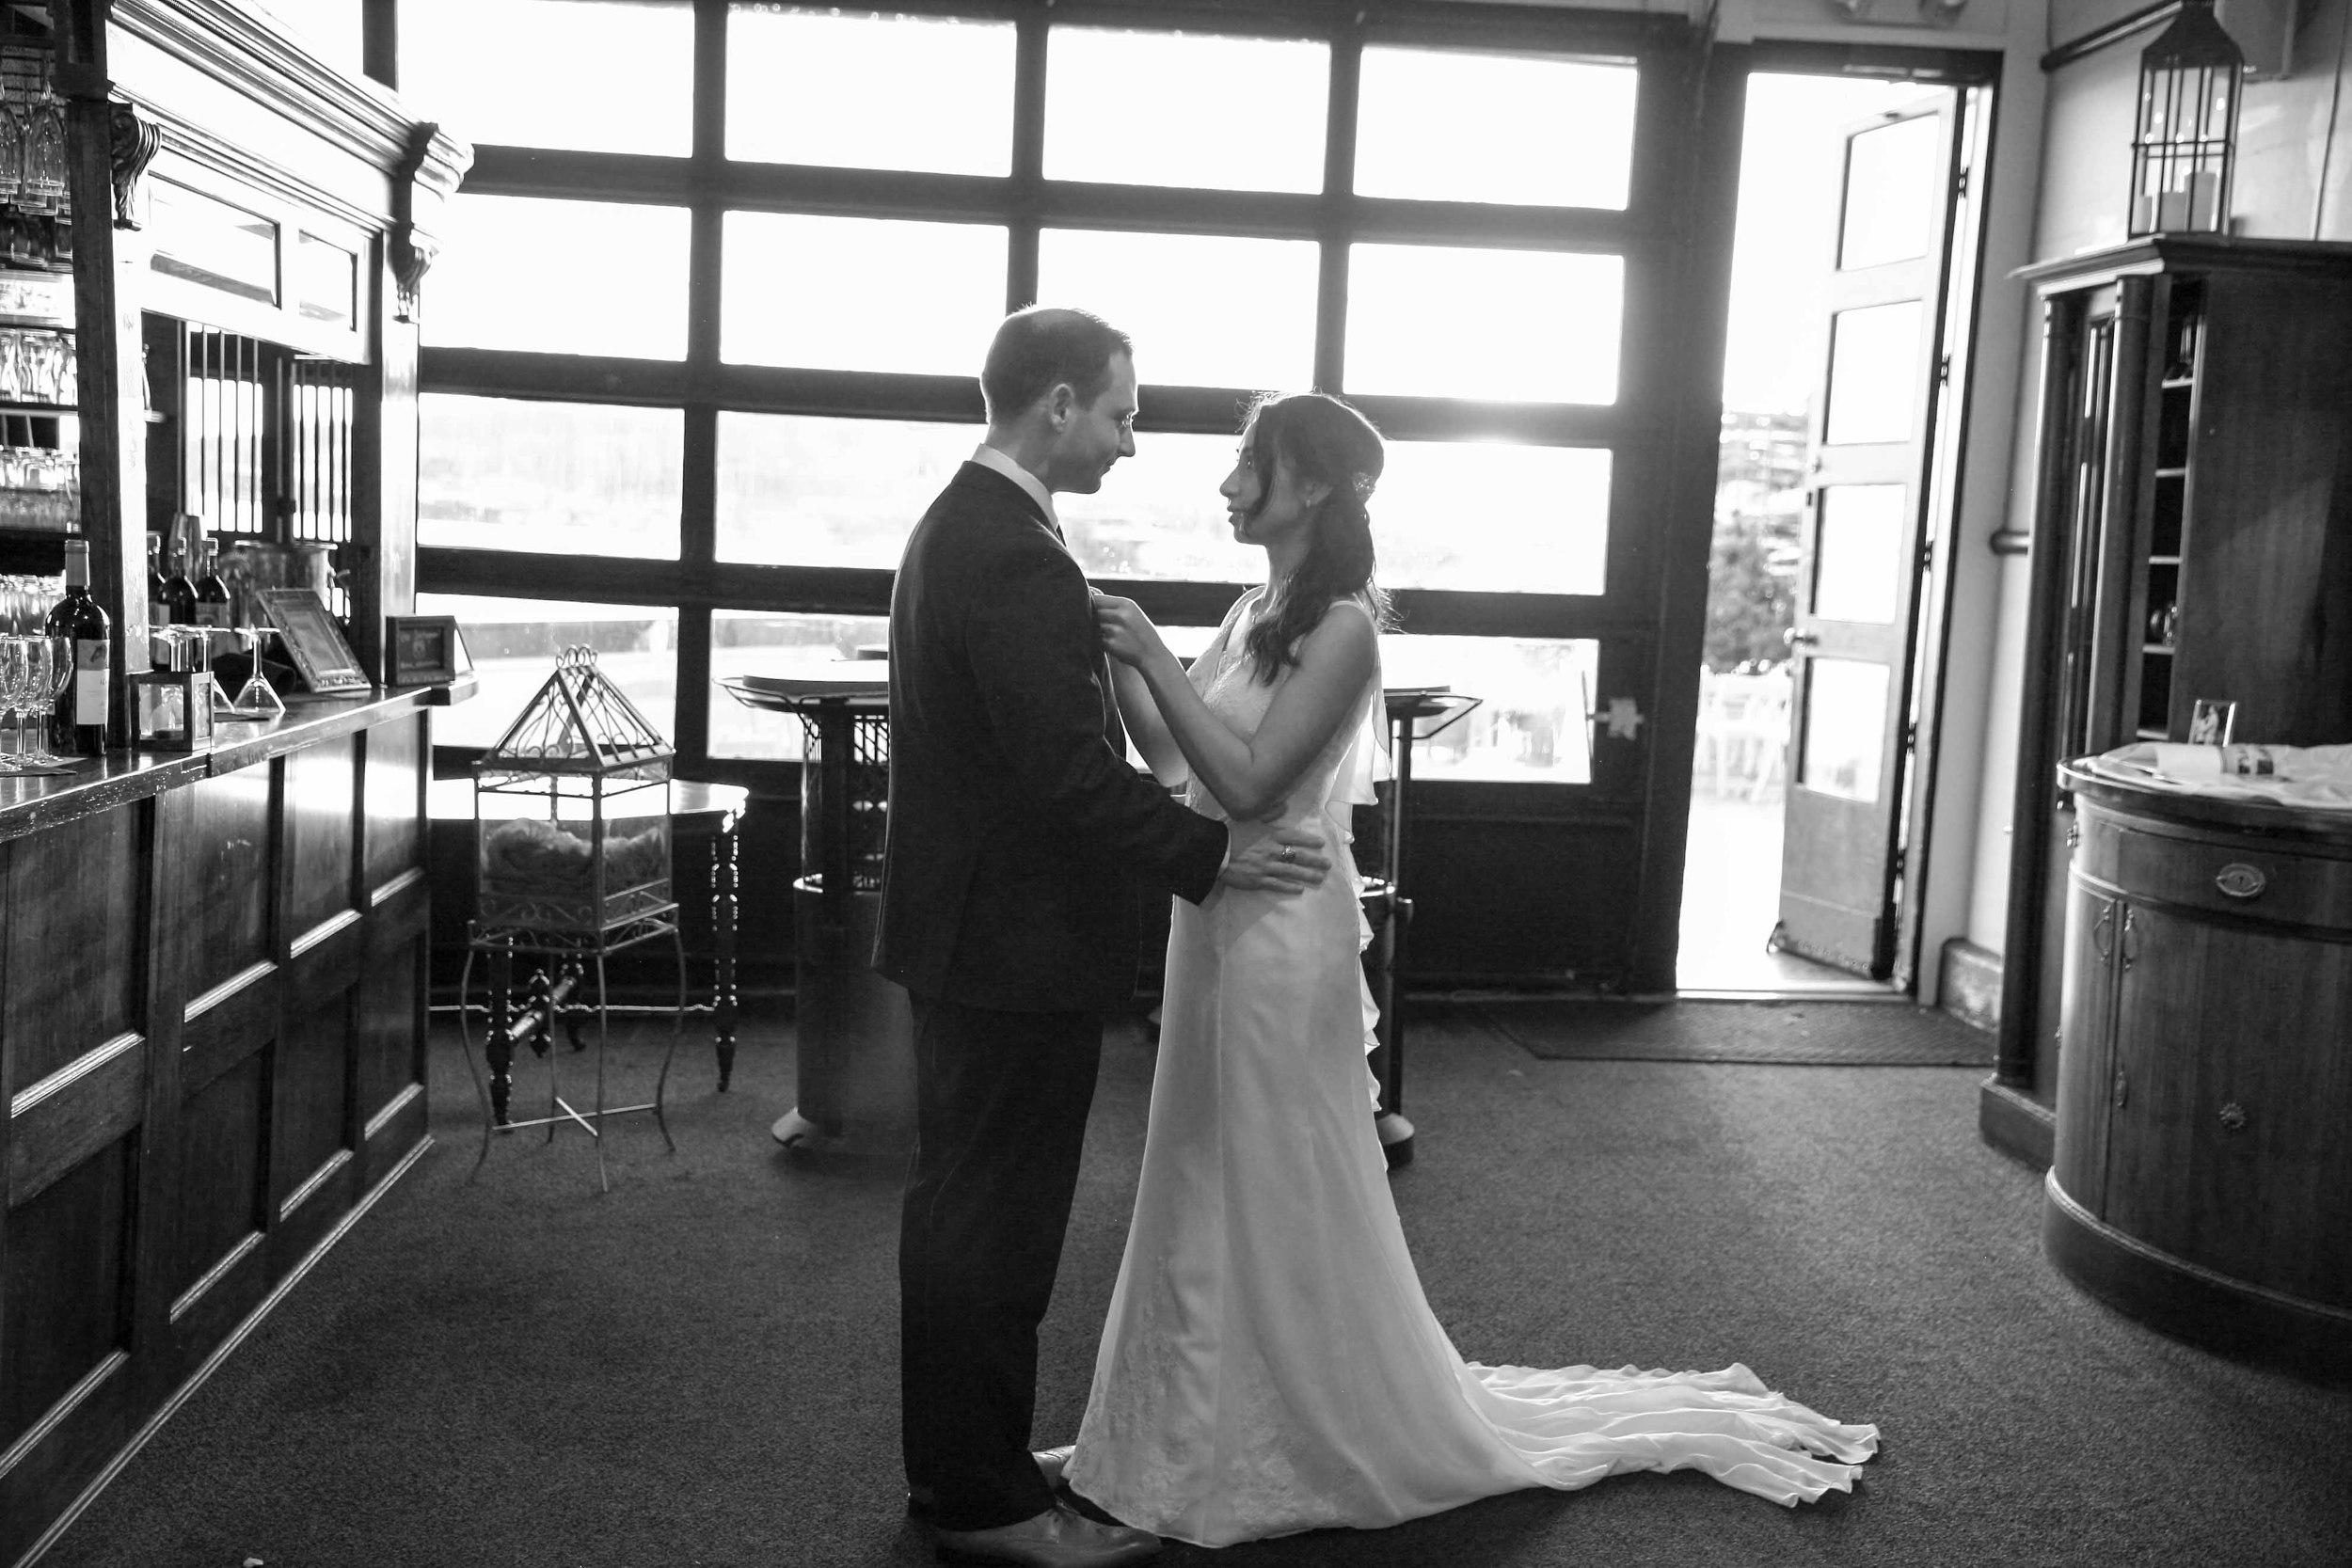 Wedding M-V Skansonia Seattle WA21.jpg